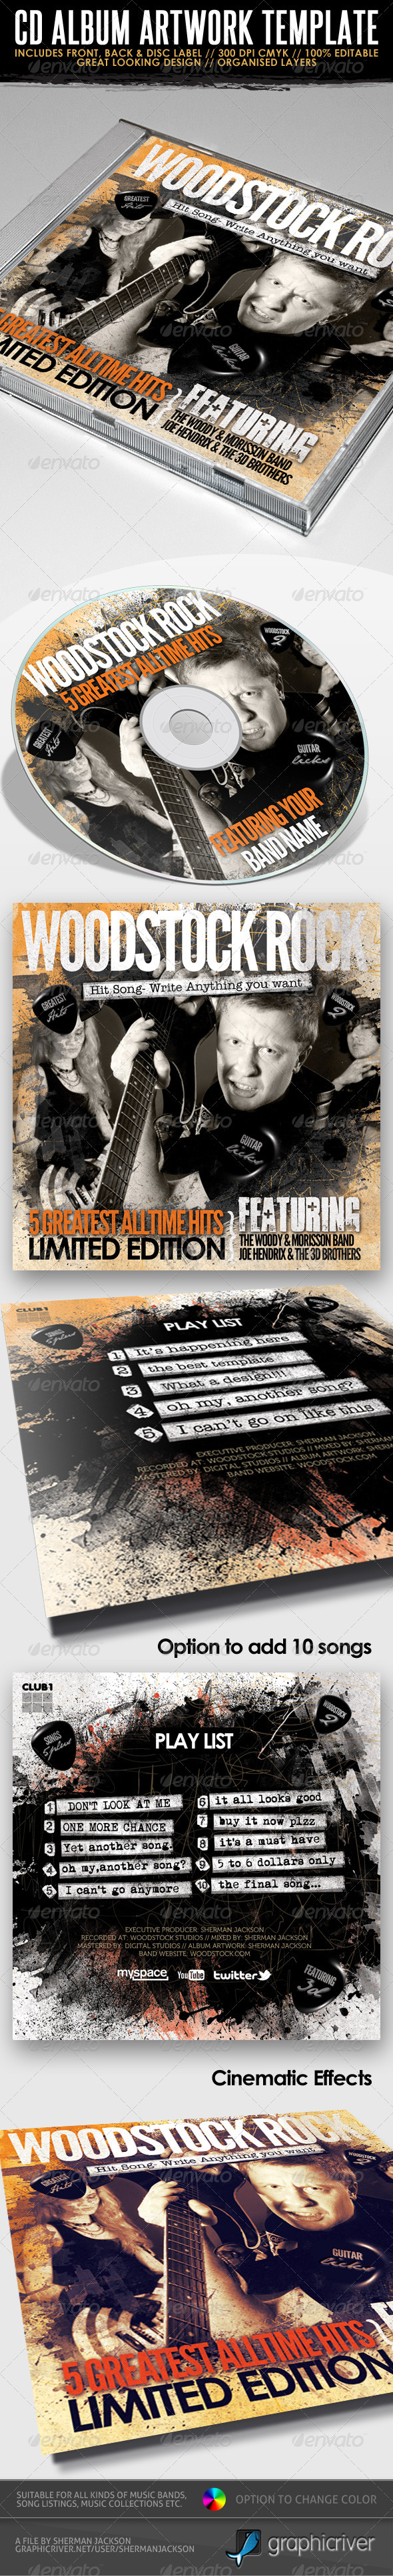 Woodstock Rock Compilation CD Artwork PSD - CD & DVD Artwork Print Templates